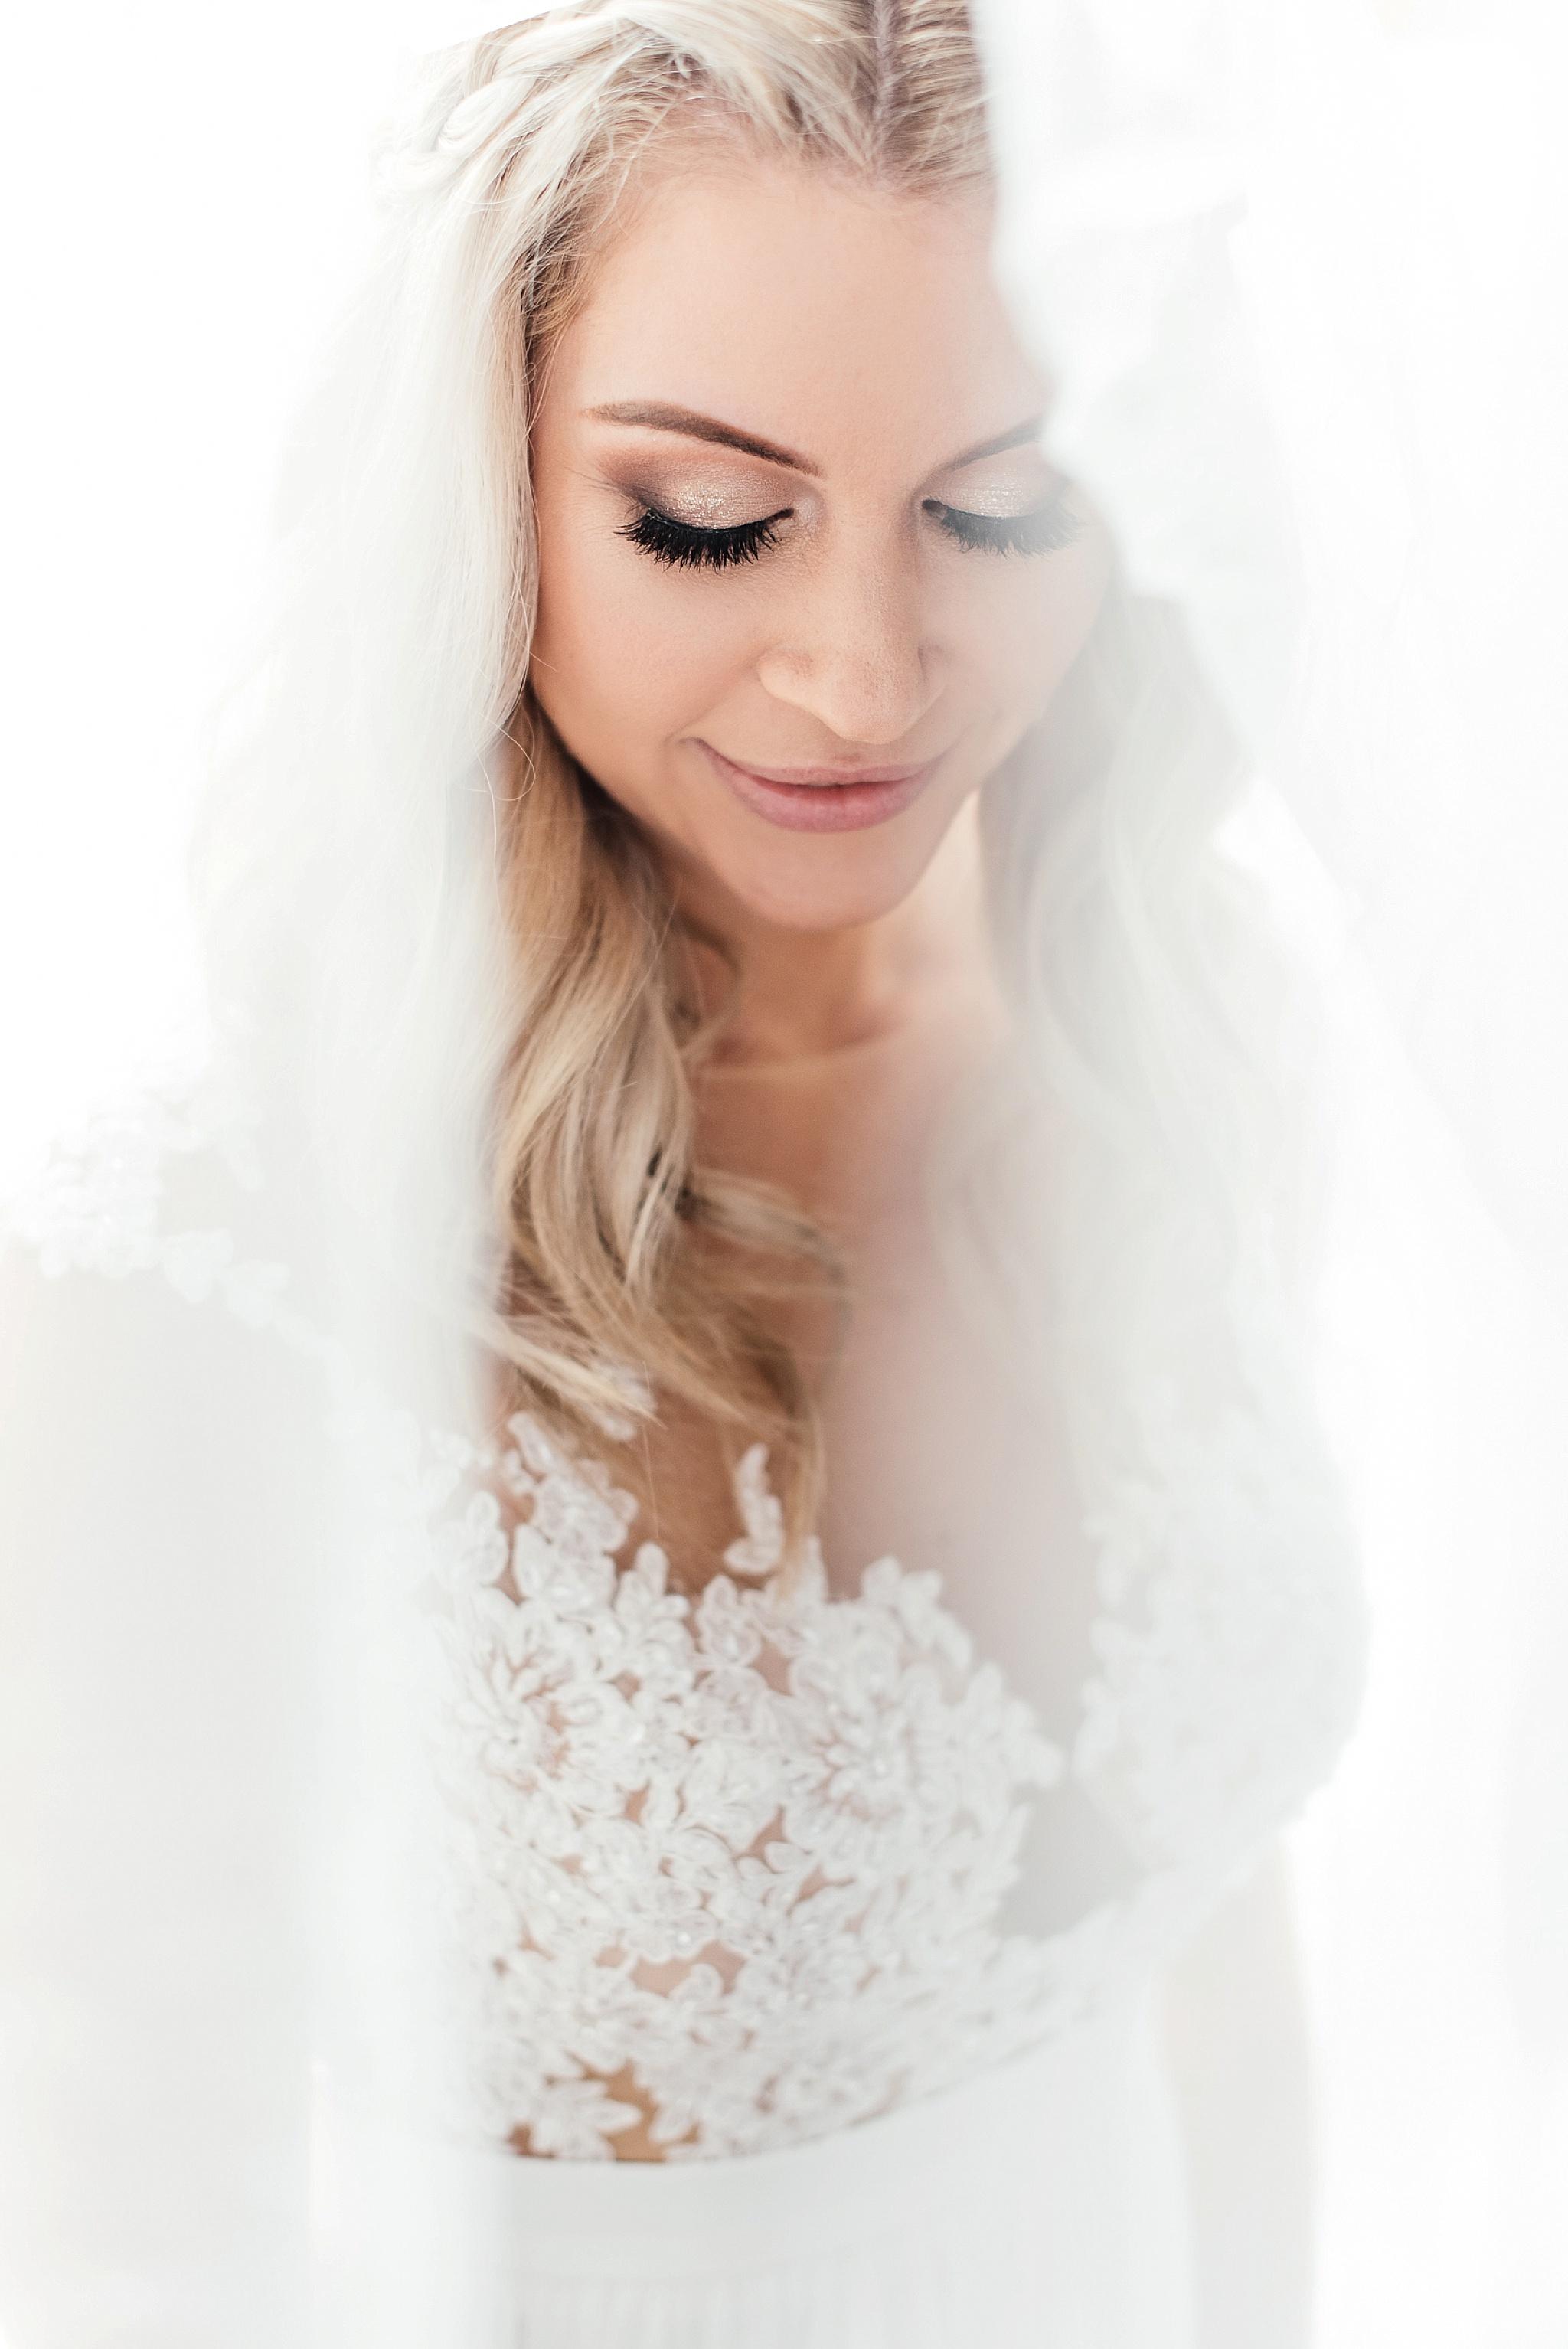 Cape Town Photographer Darren Bester - Die Woud Wedding - Gareth & Roxanne_0012.jpg